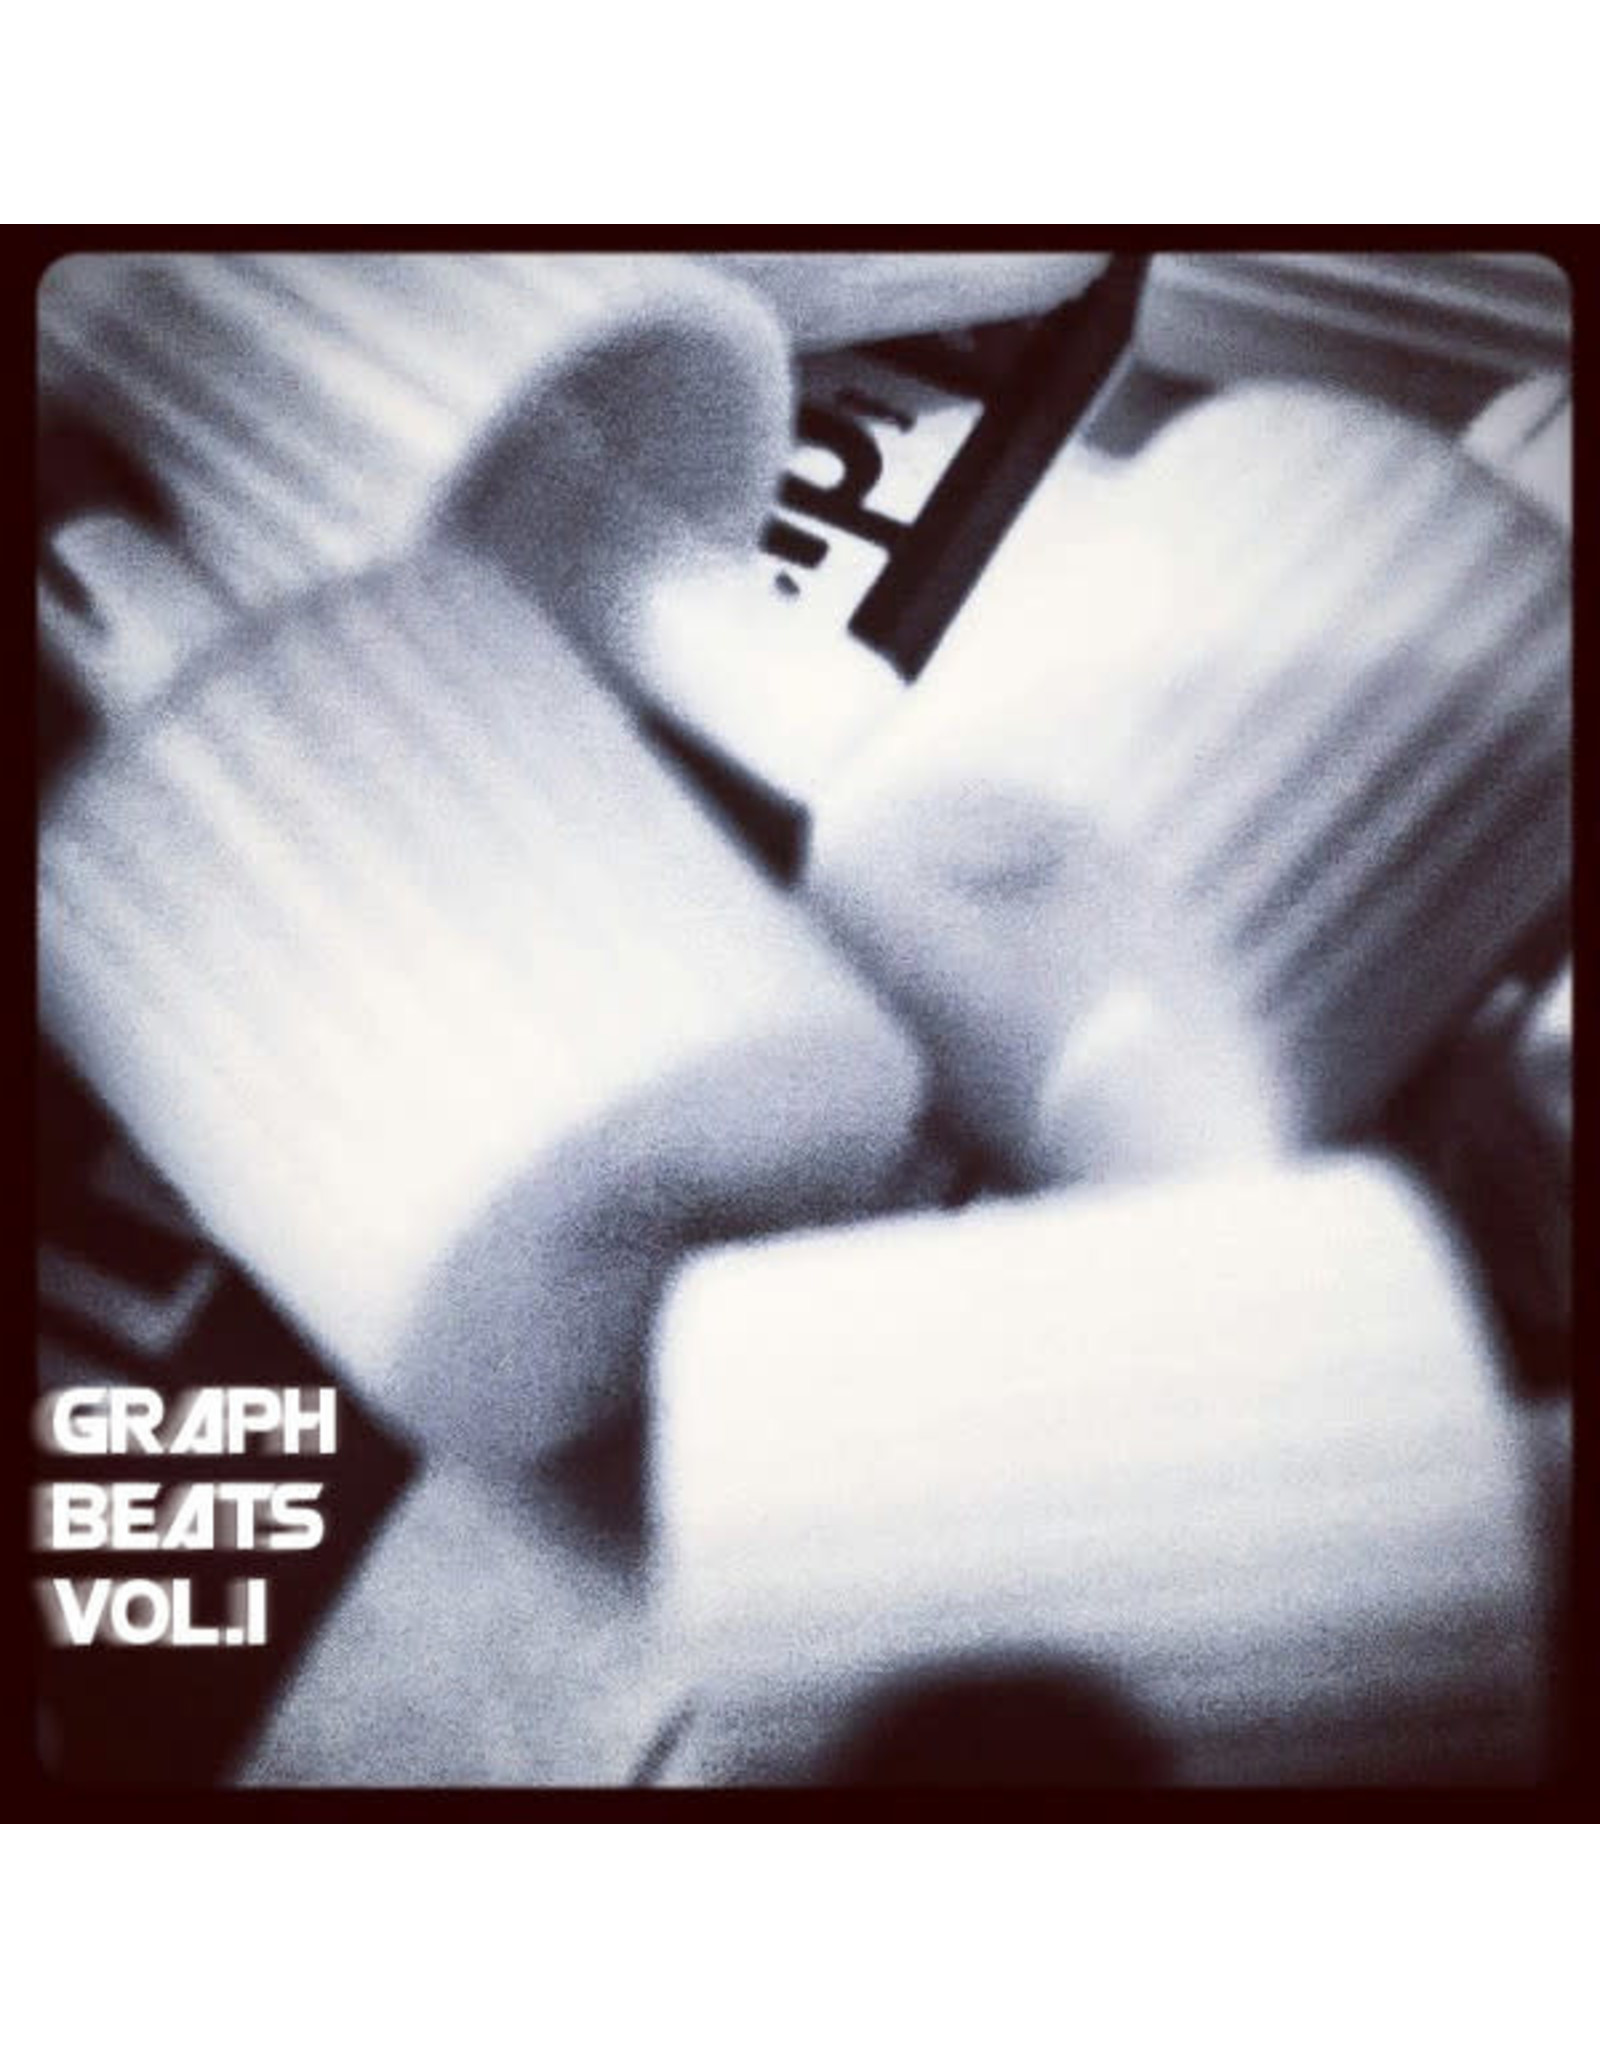 Graphwize - Graph Beats Vol. 1 LP